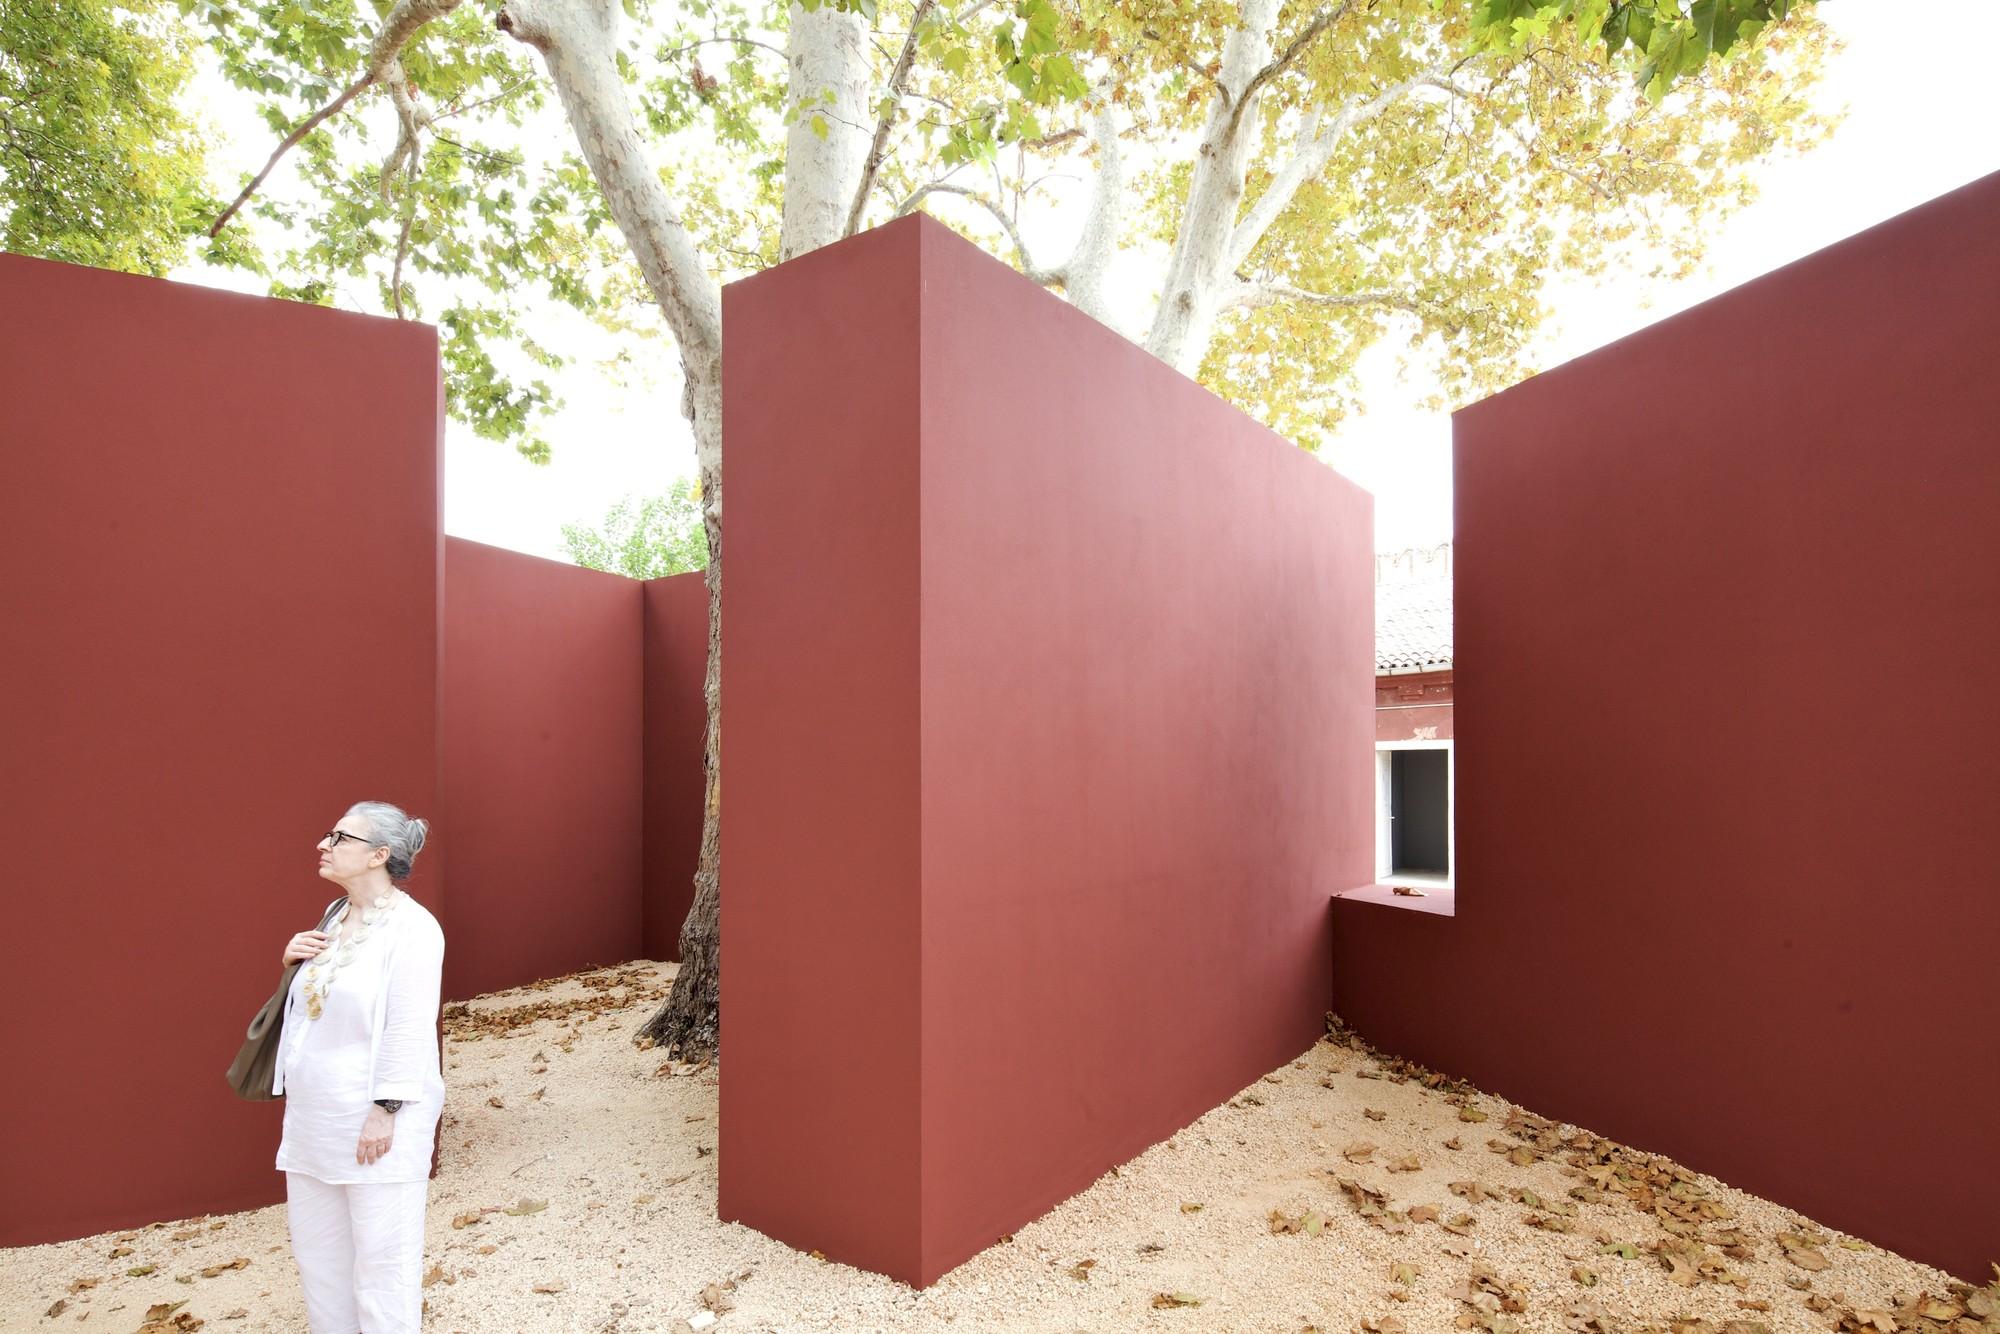 Álvaro Siza Pavilion Will Remain at Venice Bienniale Until 2016, Pavilhão de Álvaro Siza © Nico Saieh